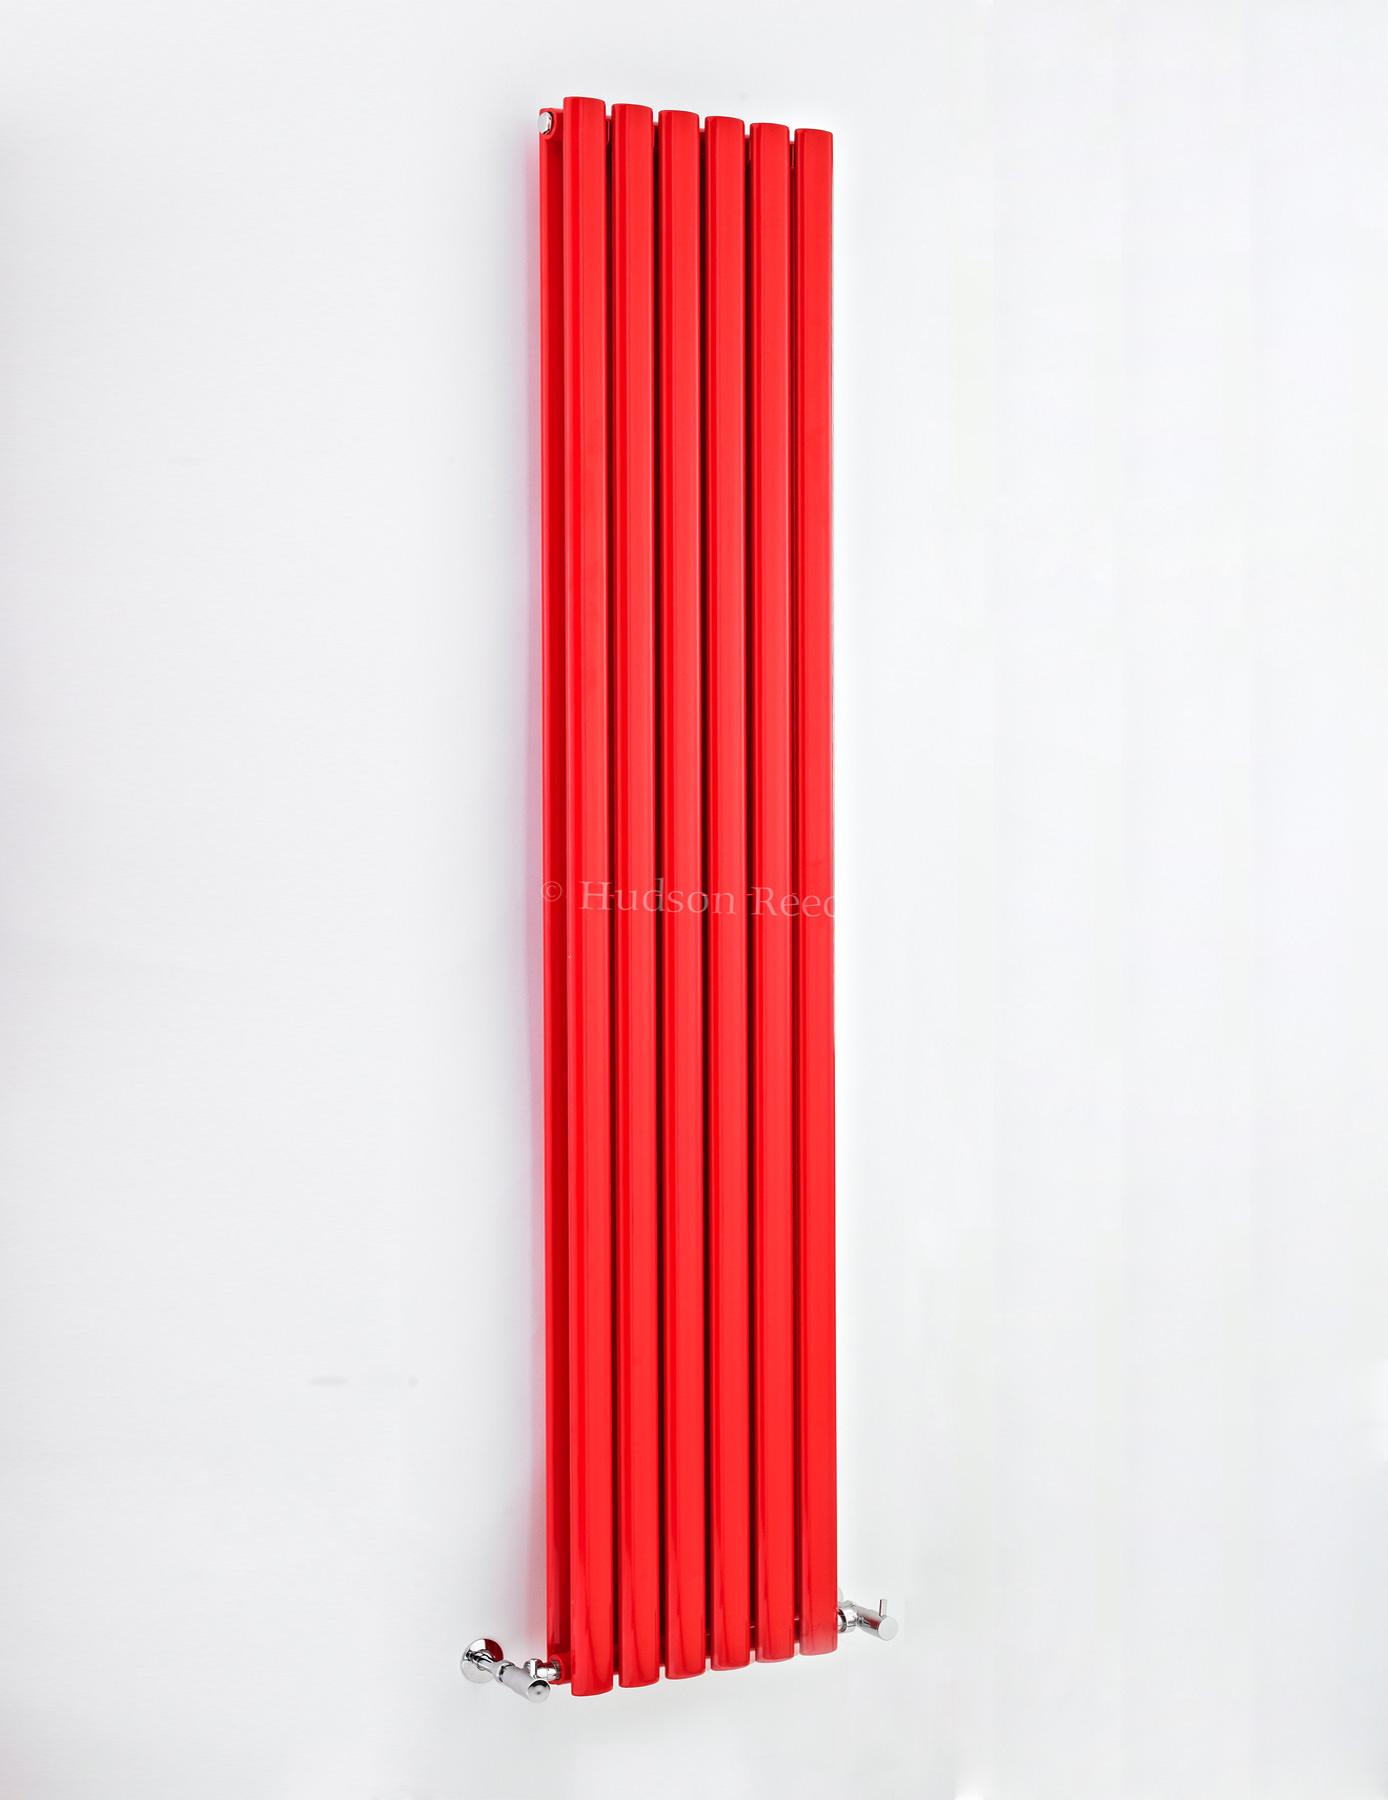 hudson reed revive 354 x 1800mm red double panel vertical. Black Bedroom Furniture Sets. Home Design Ideas